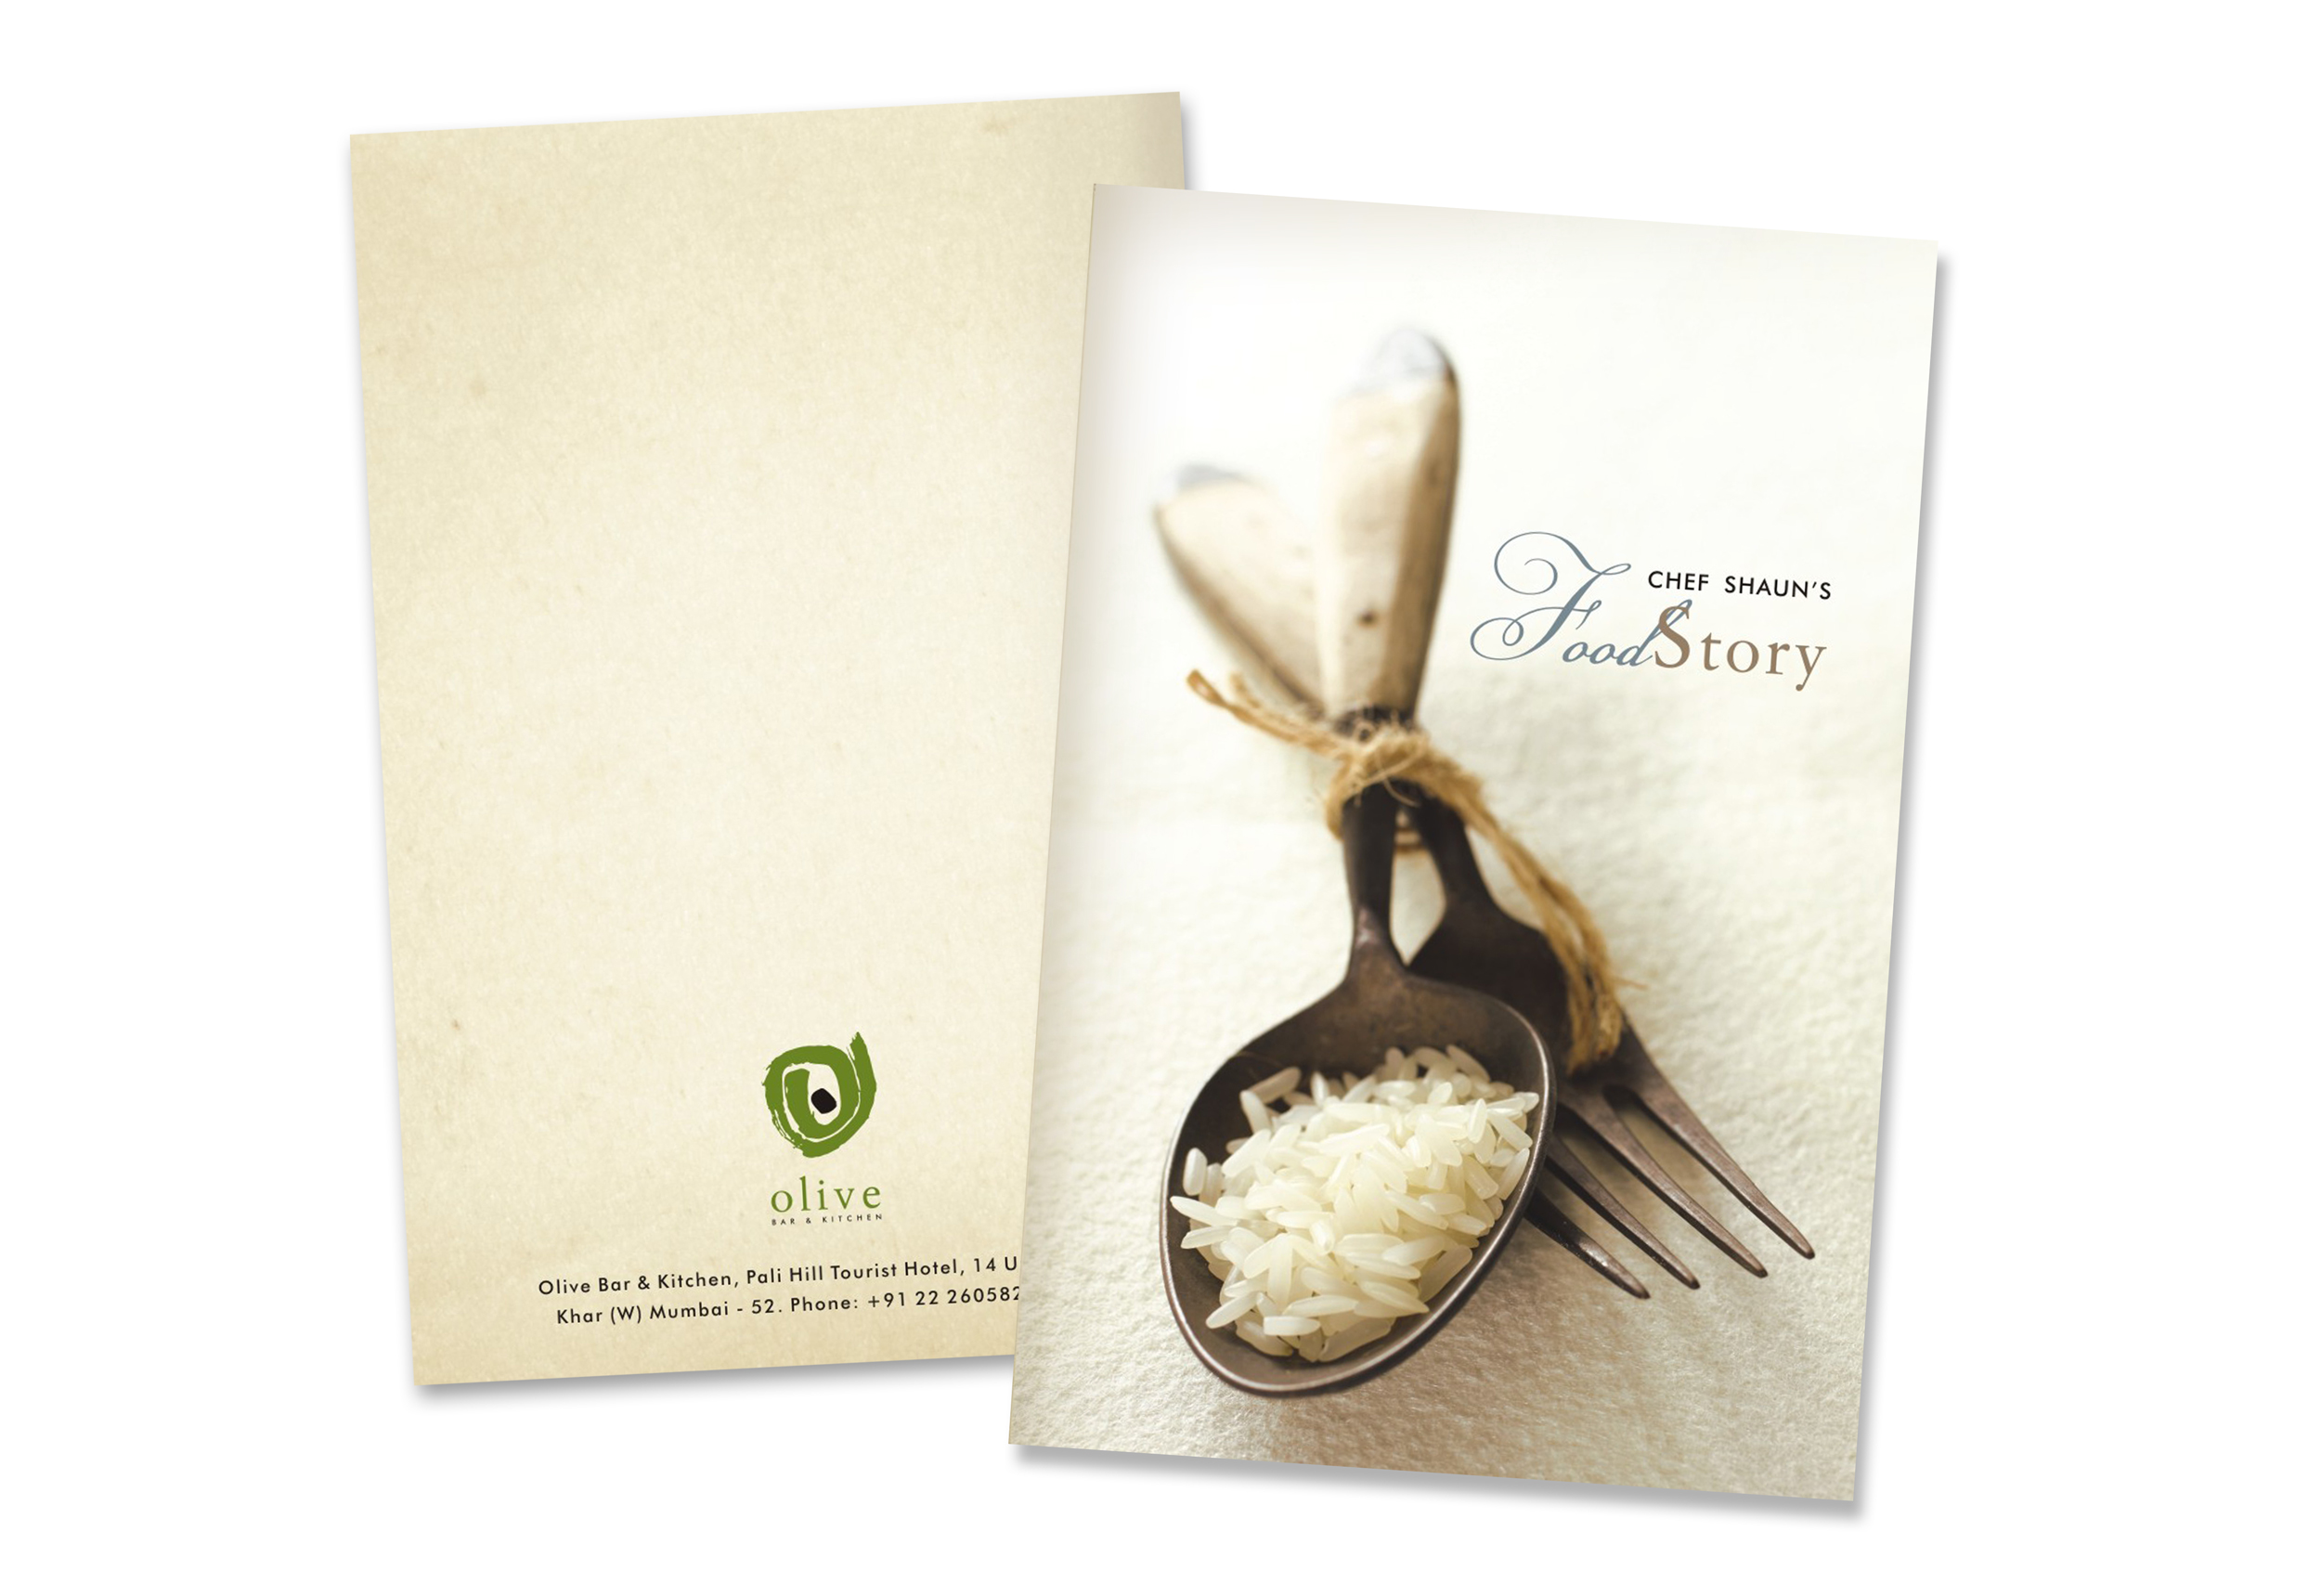 Olive Bar & Kitchen on Behance